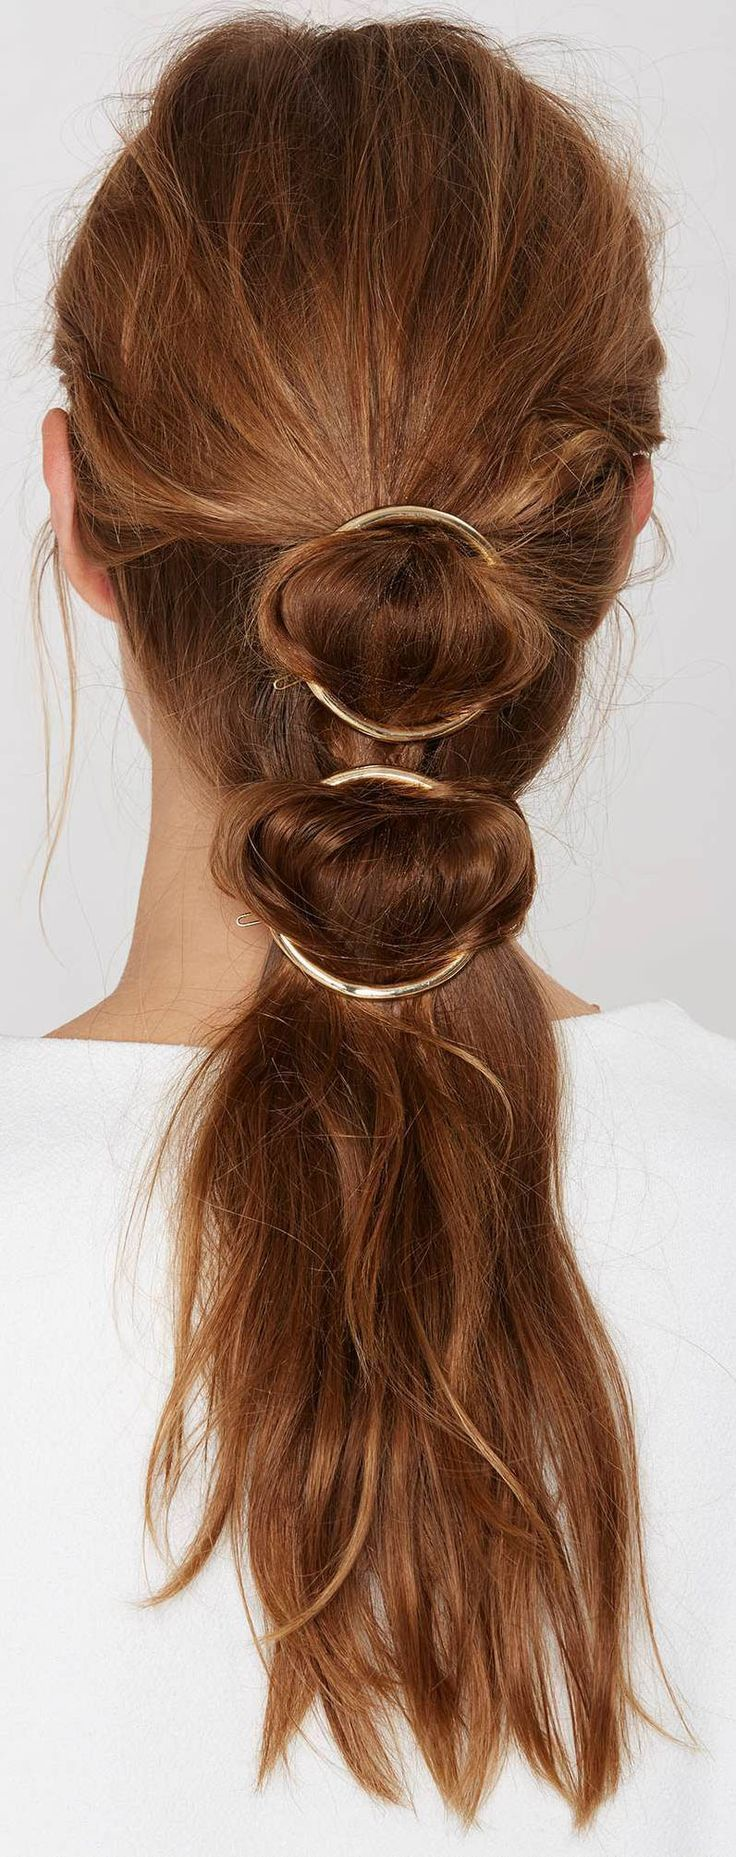 Hairdo for long hair. Boho, informal, cassual, easy, quick.